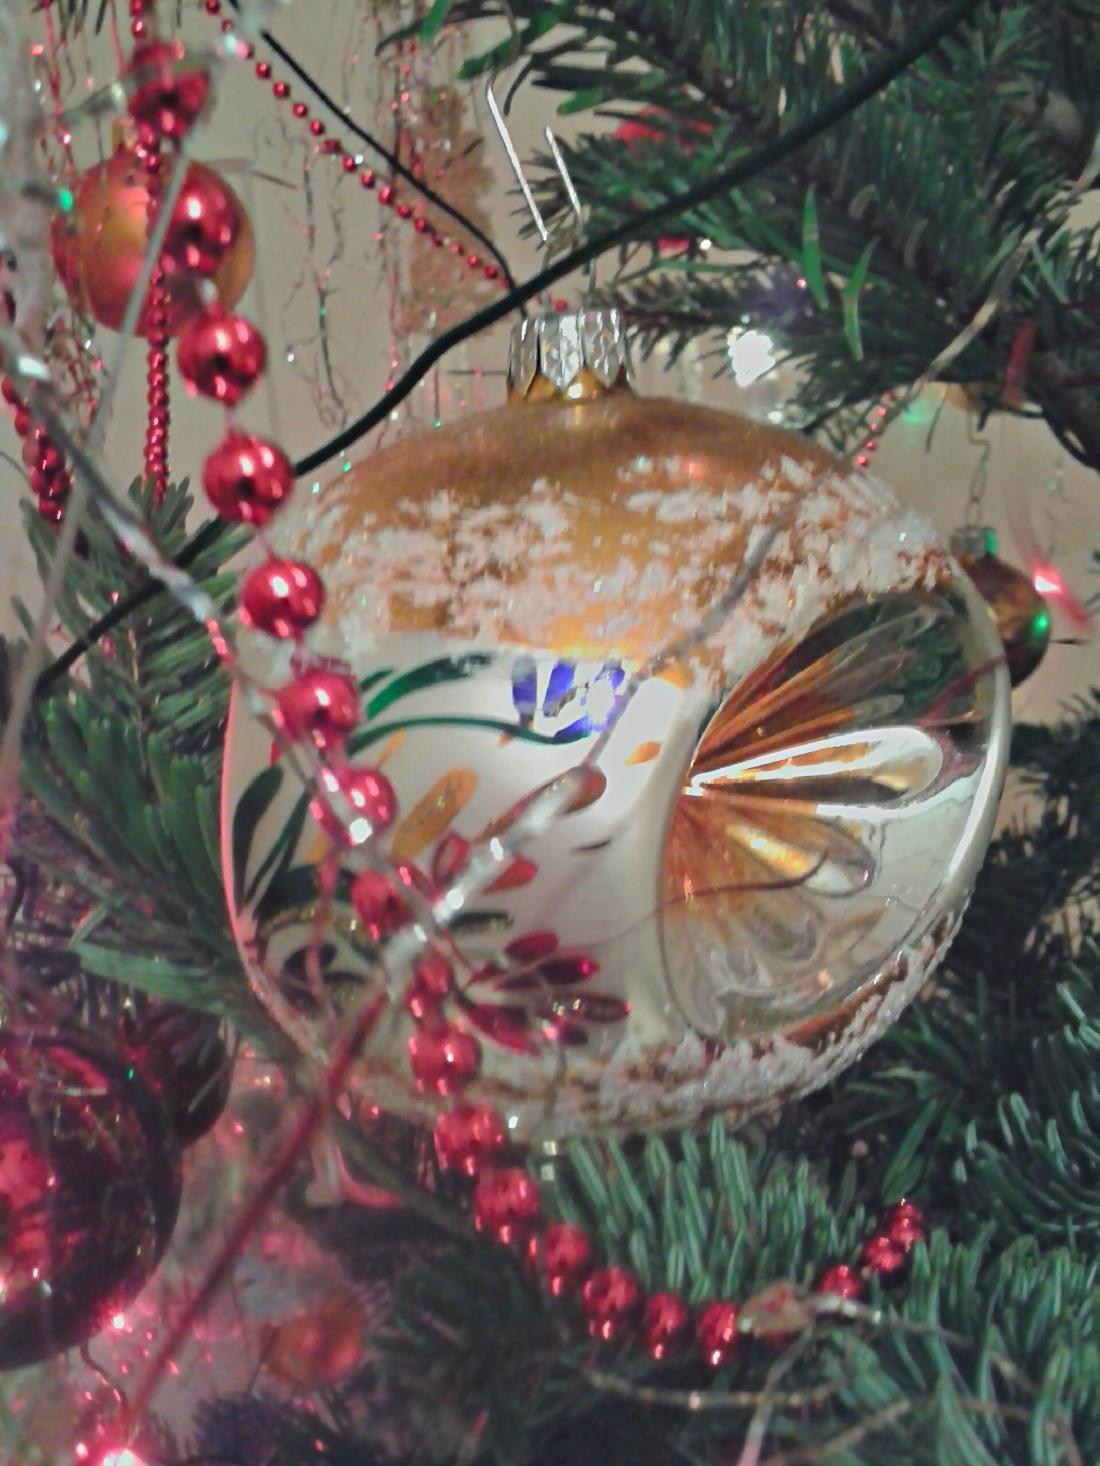 2013-12-28_23-16-58_HDR